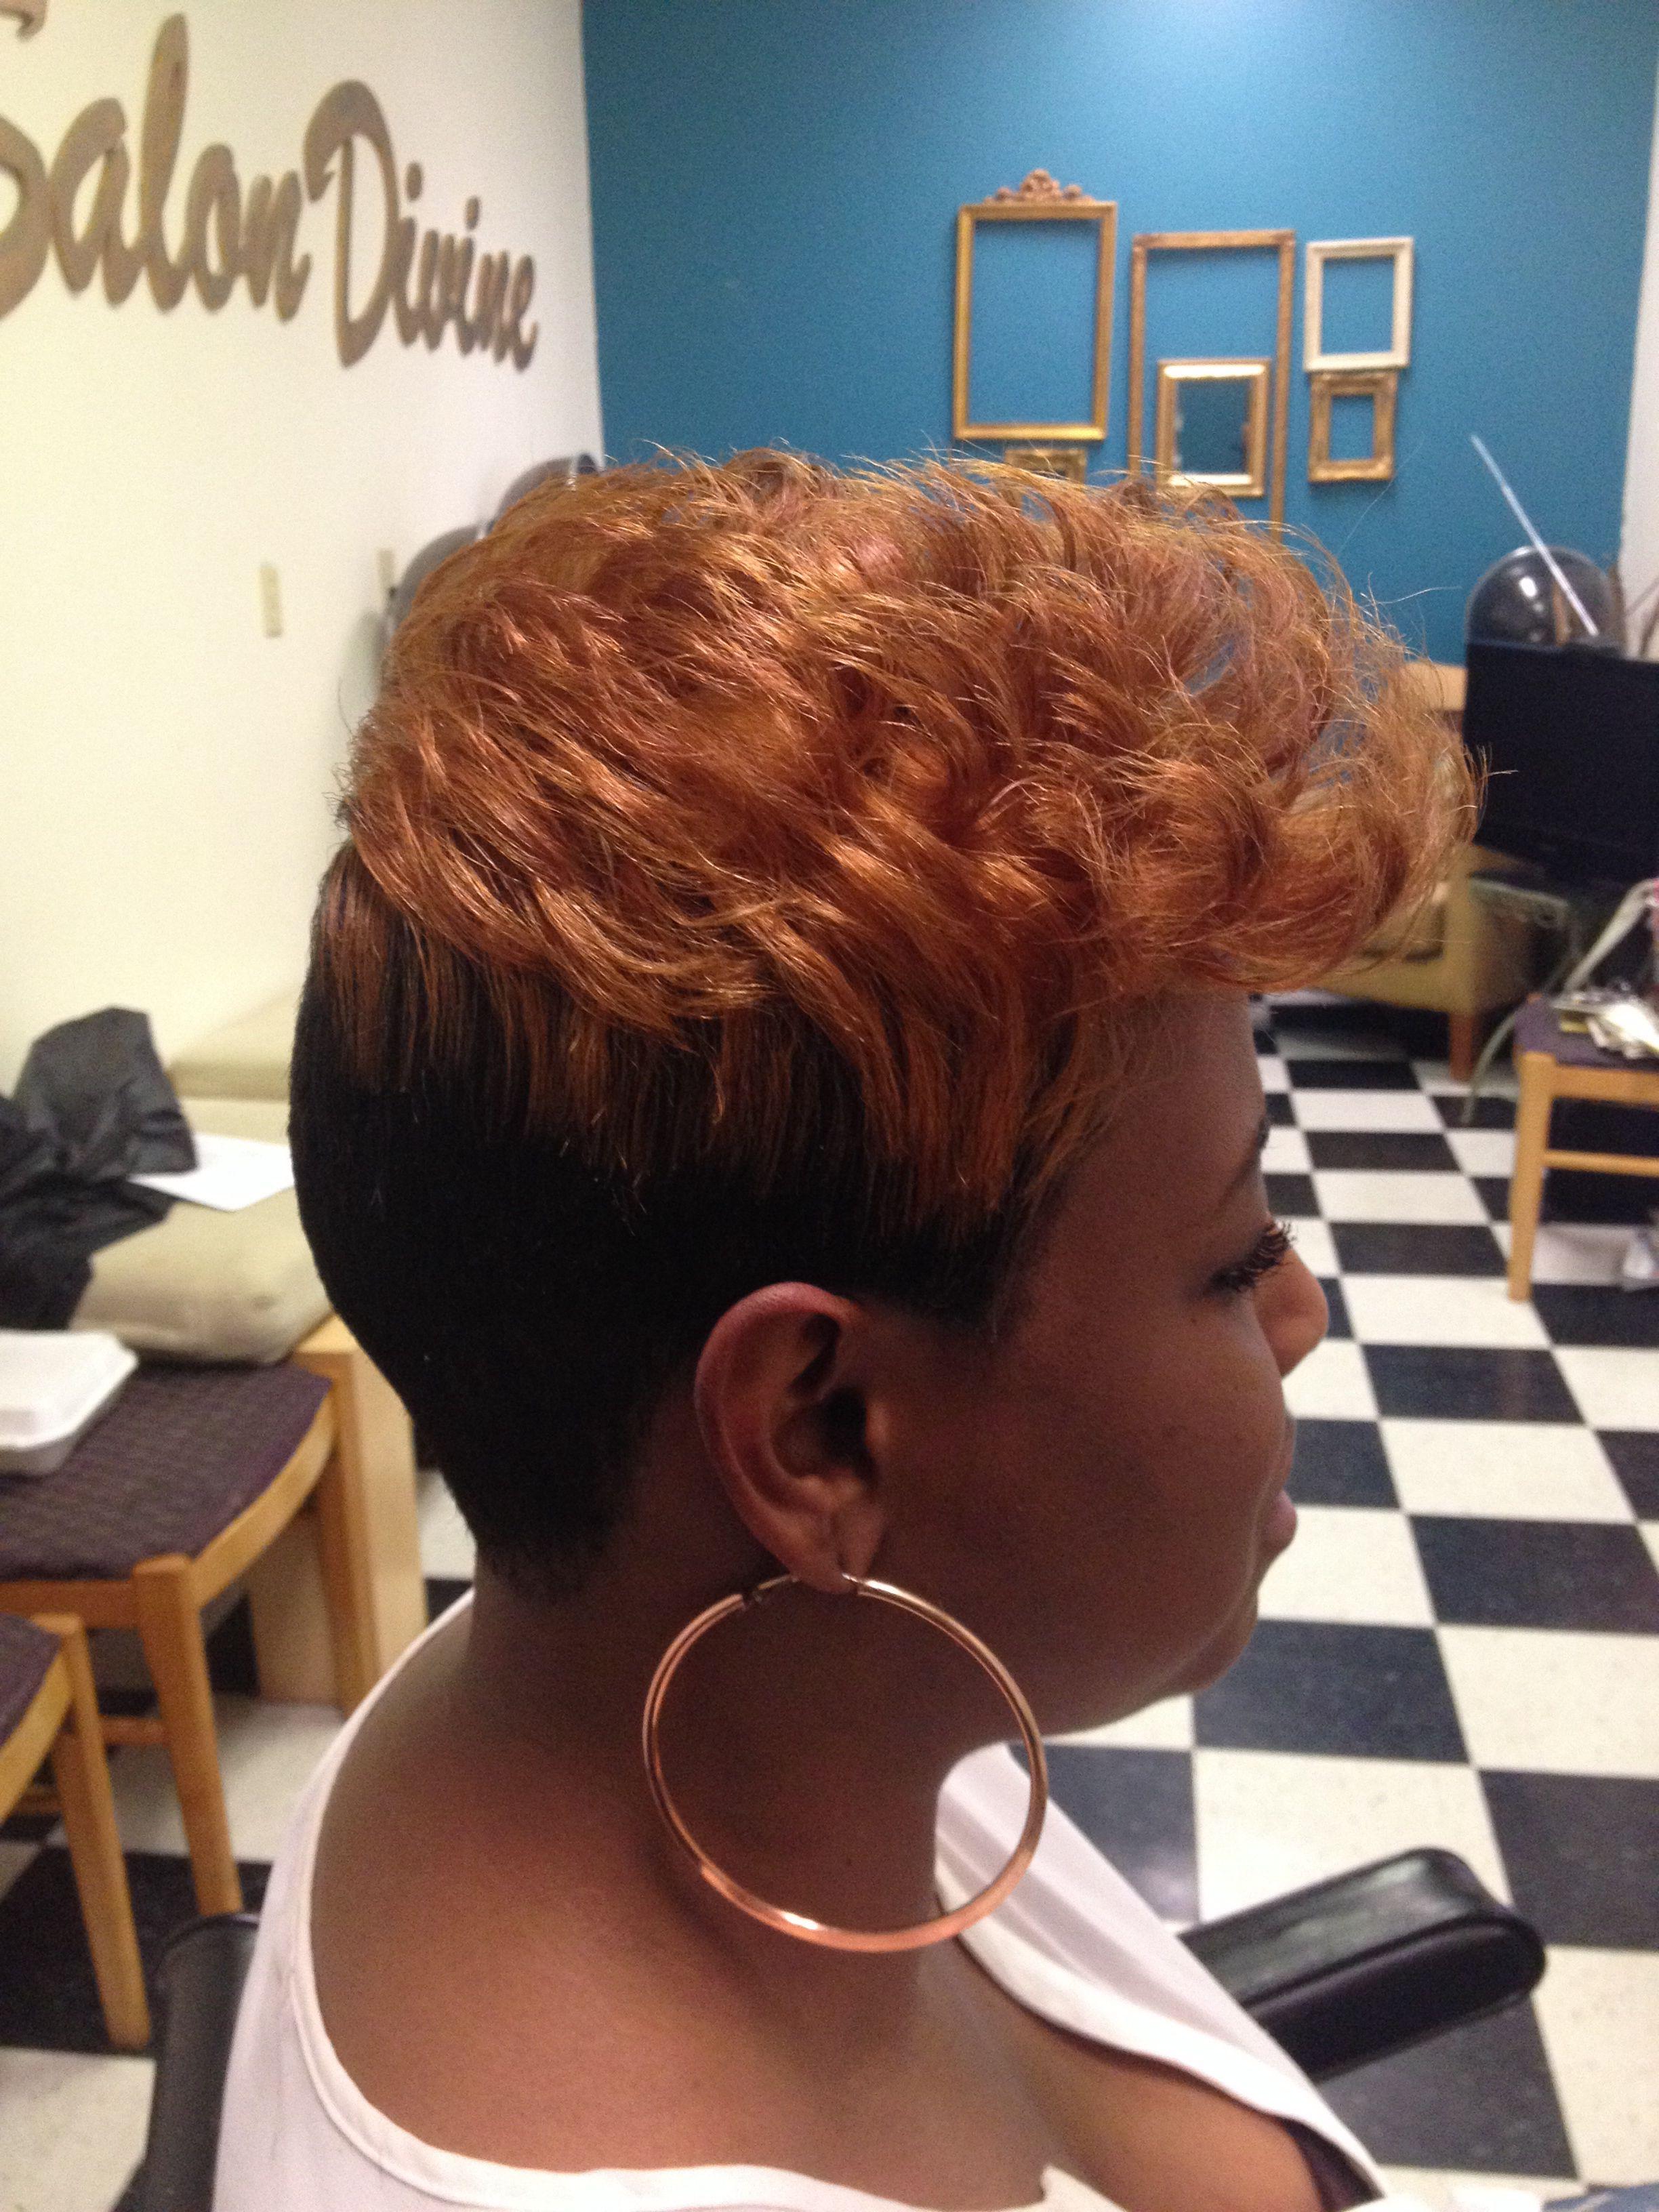 Crochet Hair Memphis Tn : Short Hair Stylist Memphis Tn hairstylegalleries.com